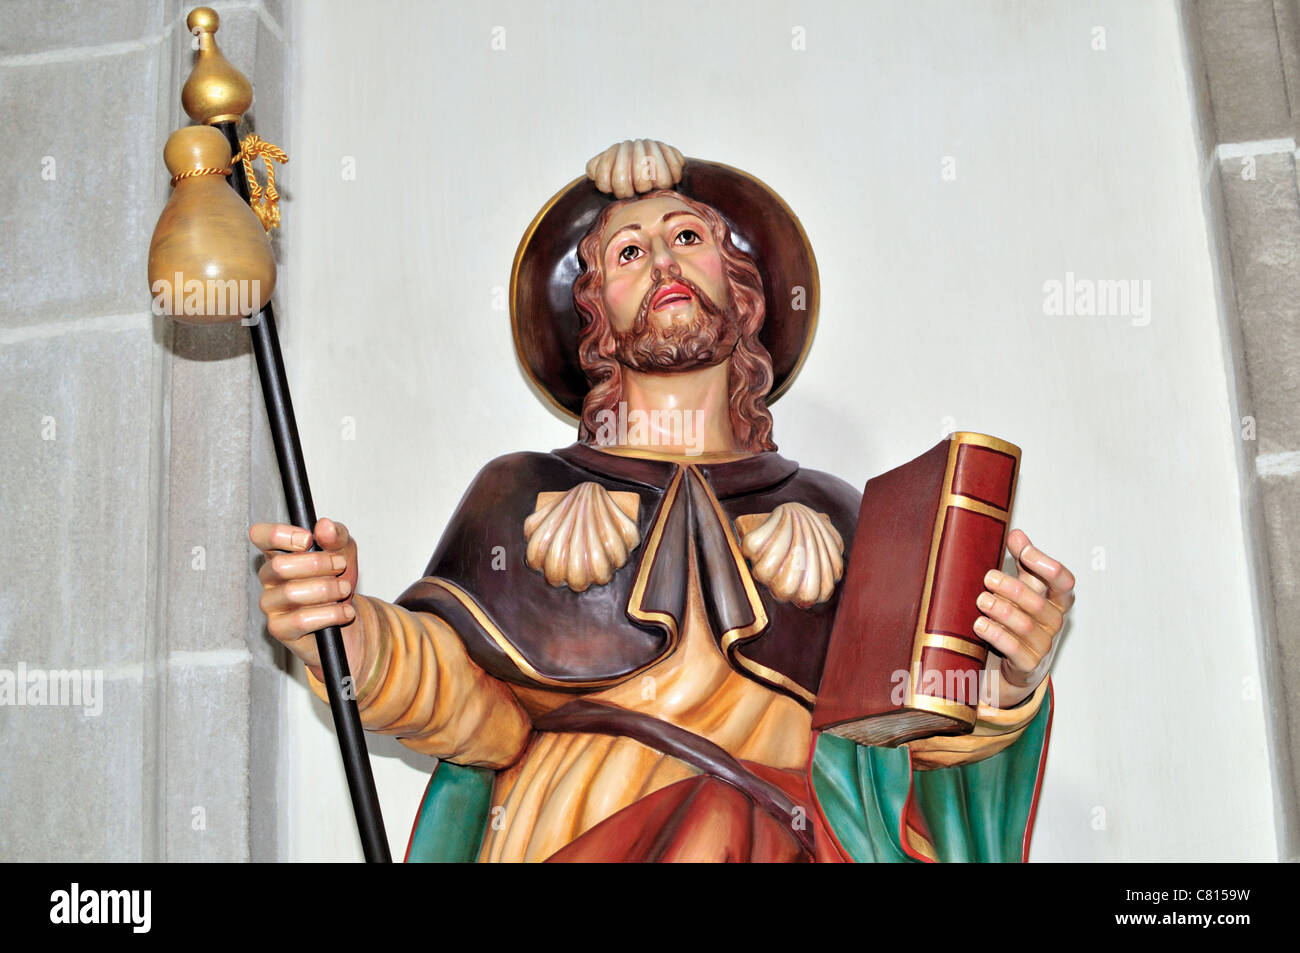 Spain, St. James Way: Sculpture of Saint James in the Basilica of Monastery San Xulian de Samos Stock Photo